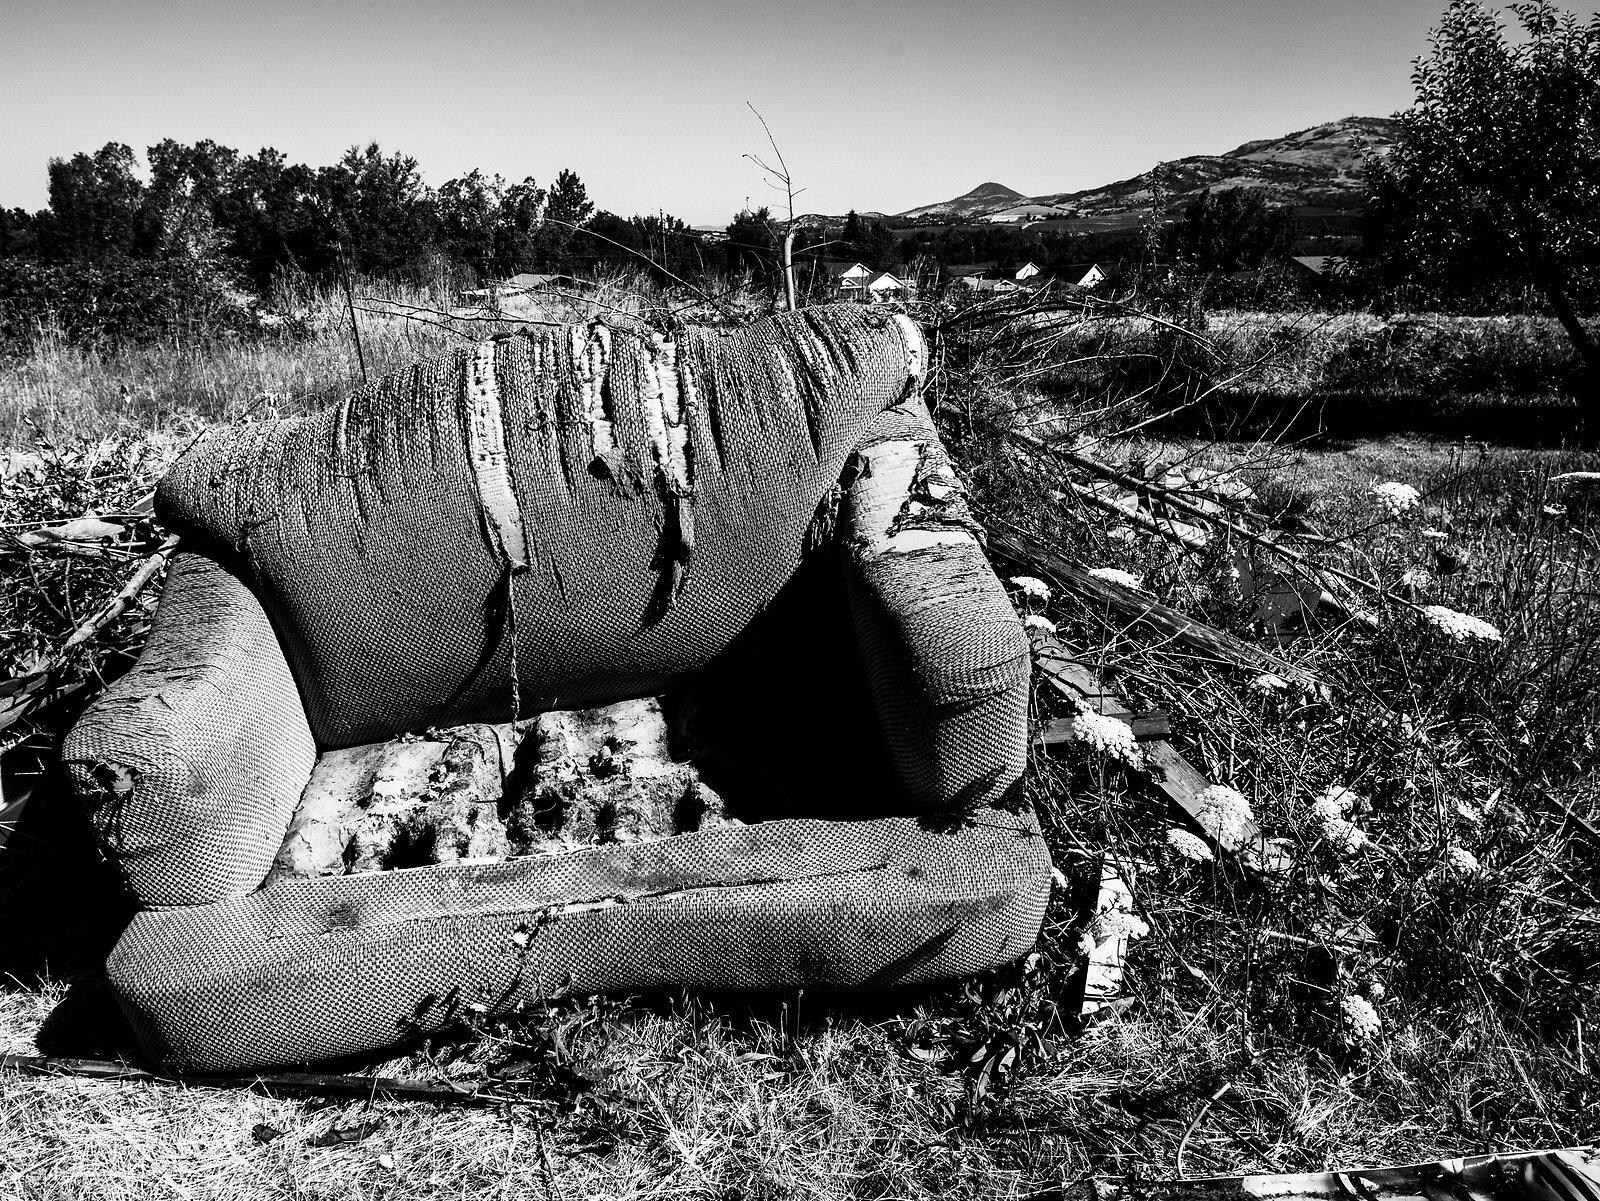 Couch-Acros100.jpg